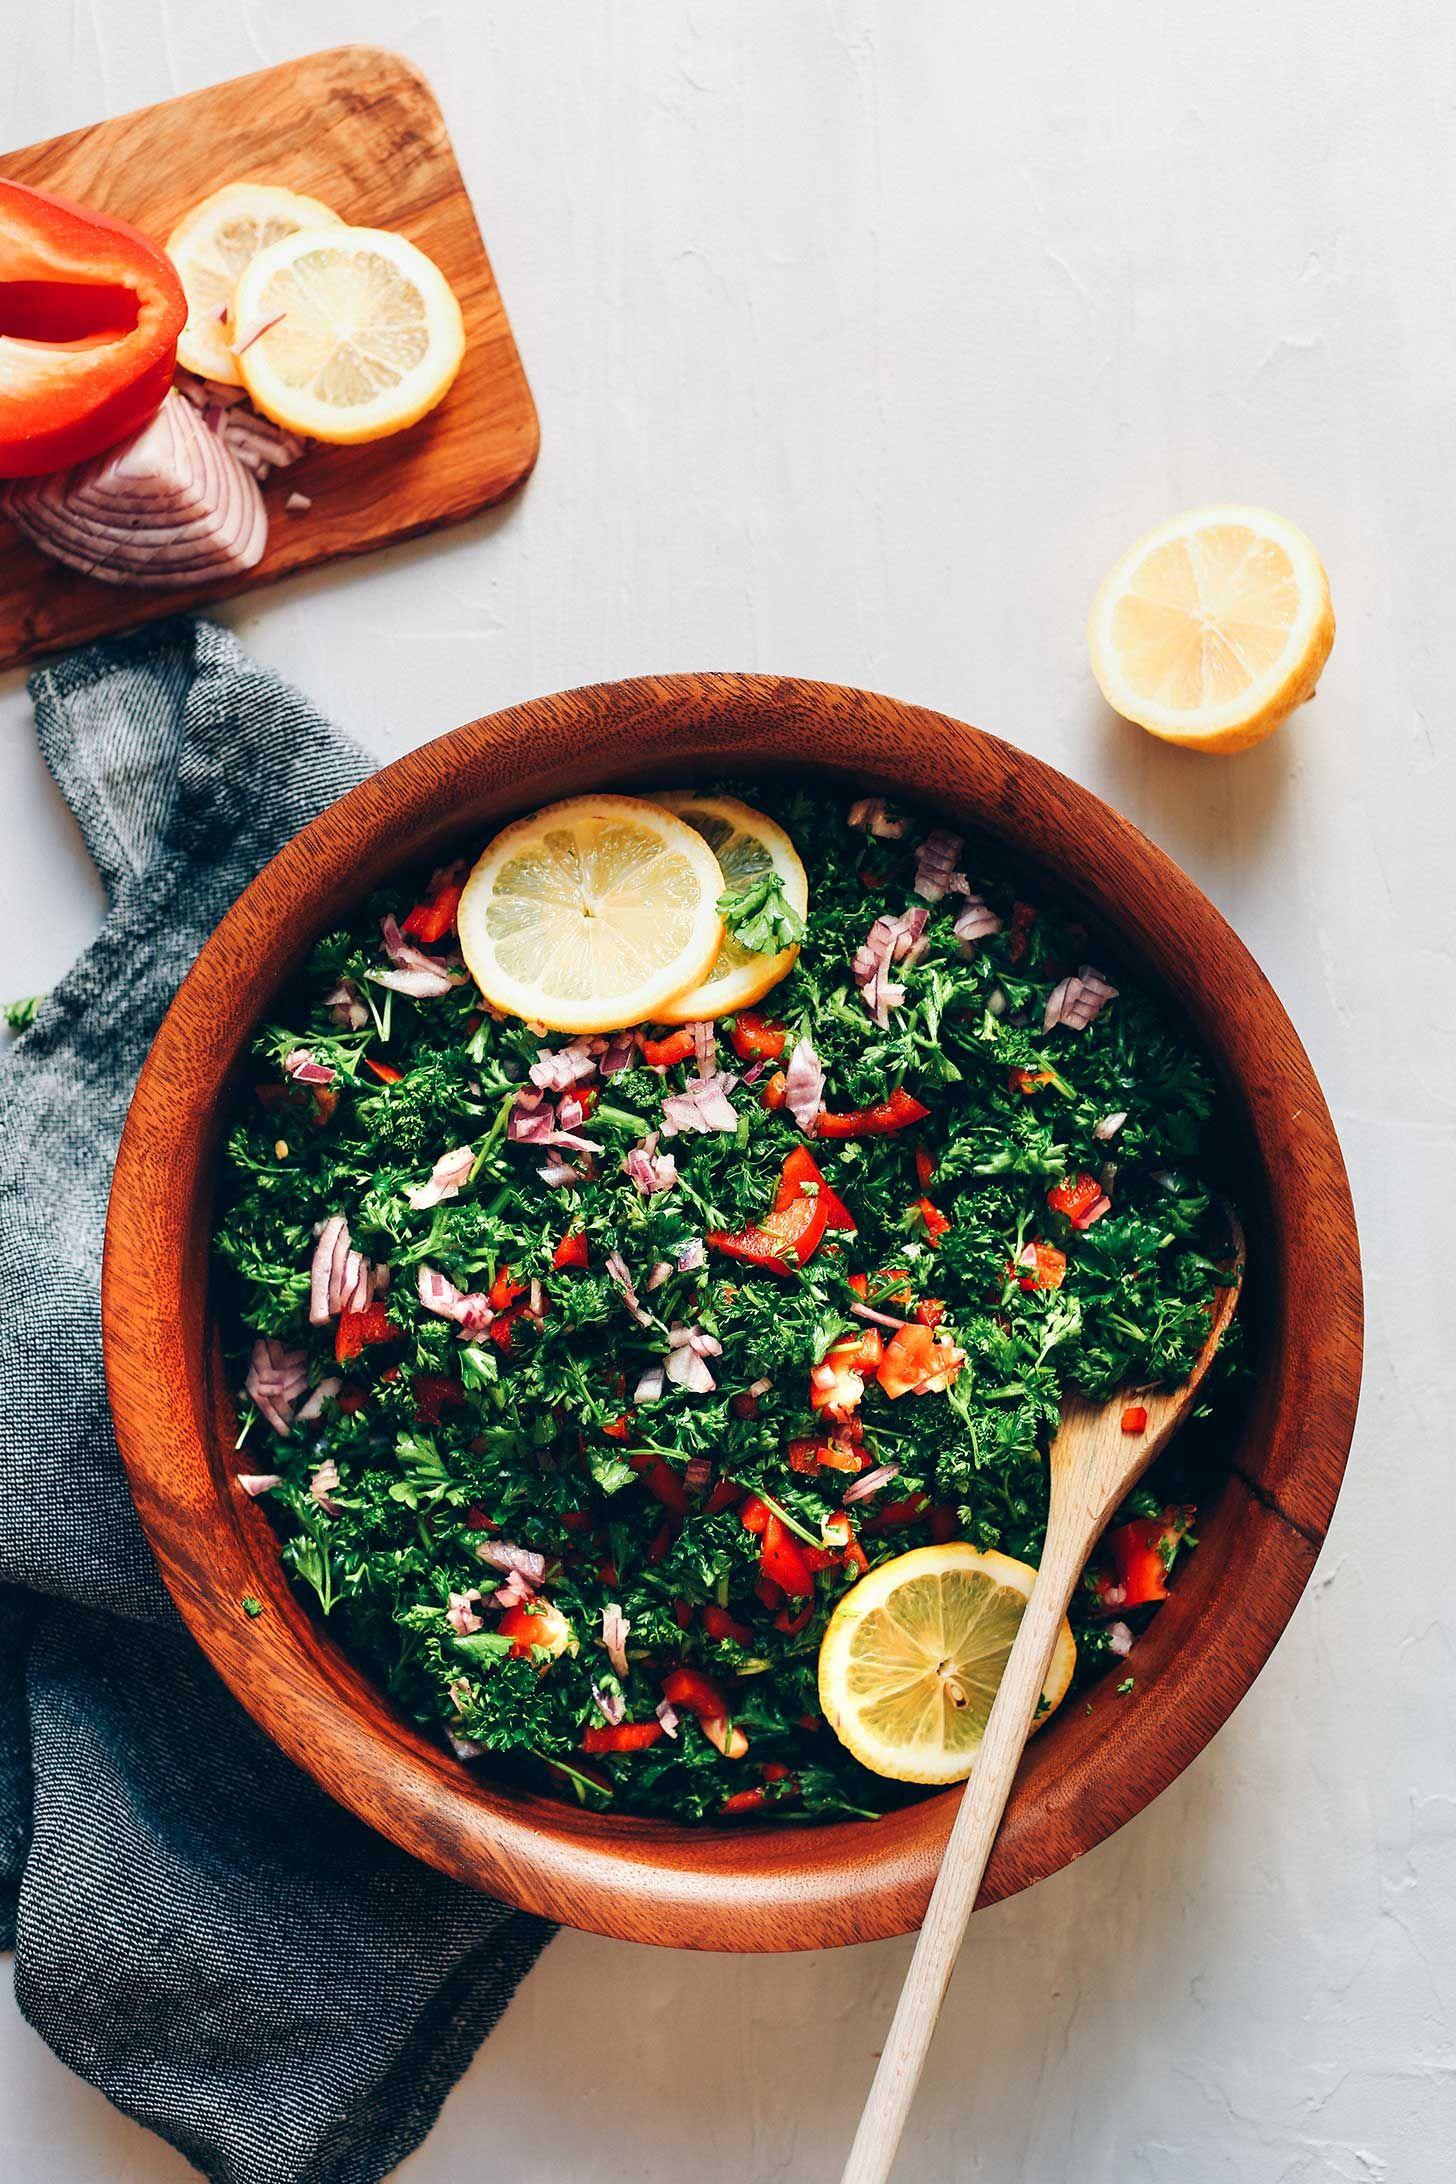 PERFECT Grain-Free Tabbouleh Salad! Detoxifying, 6 ingredients, flavorful! #vegan #glutenfree #tabbouleh #salad #plantbased #recipe #minimalistbaker